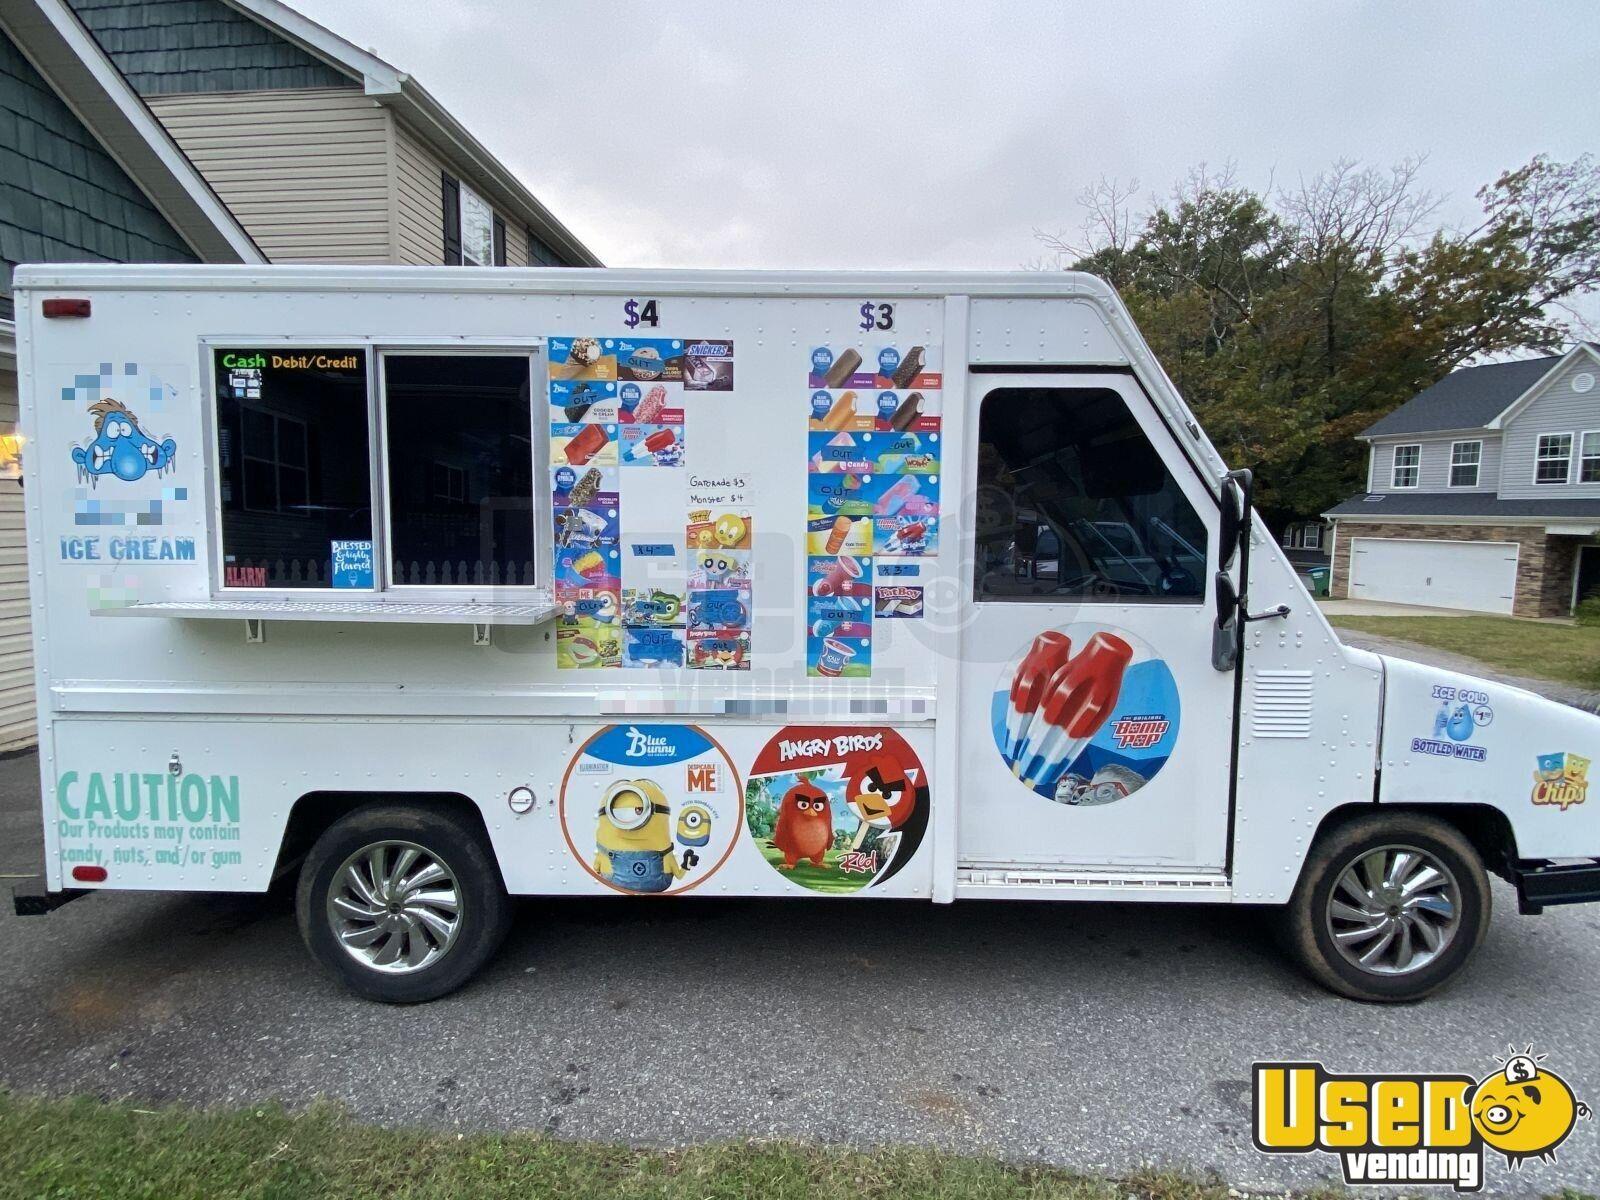 15 Dodge Aeromate Mobile Ice Cream Shop Used Ice Cream Truck For Sale In North Carolina Trucks For Sale Ice Cream Shop Ice Cream Truck